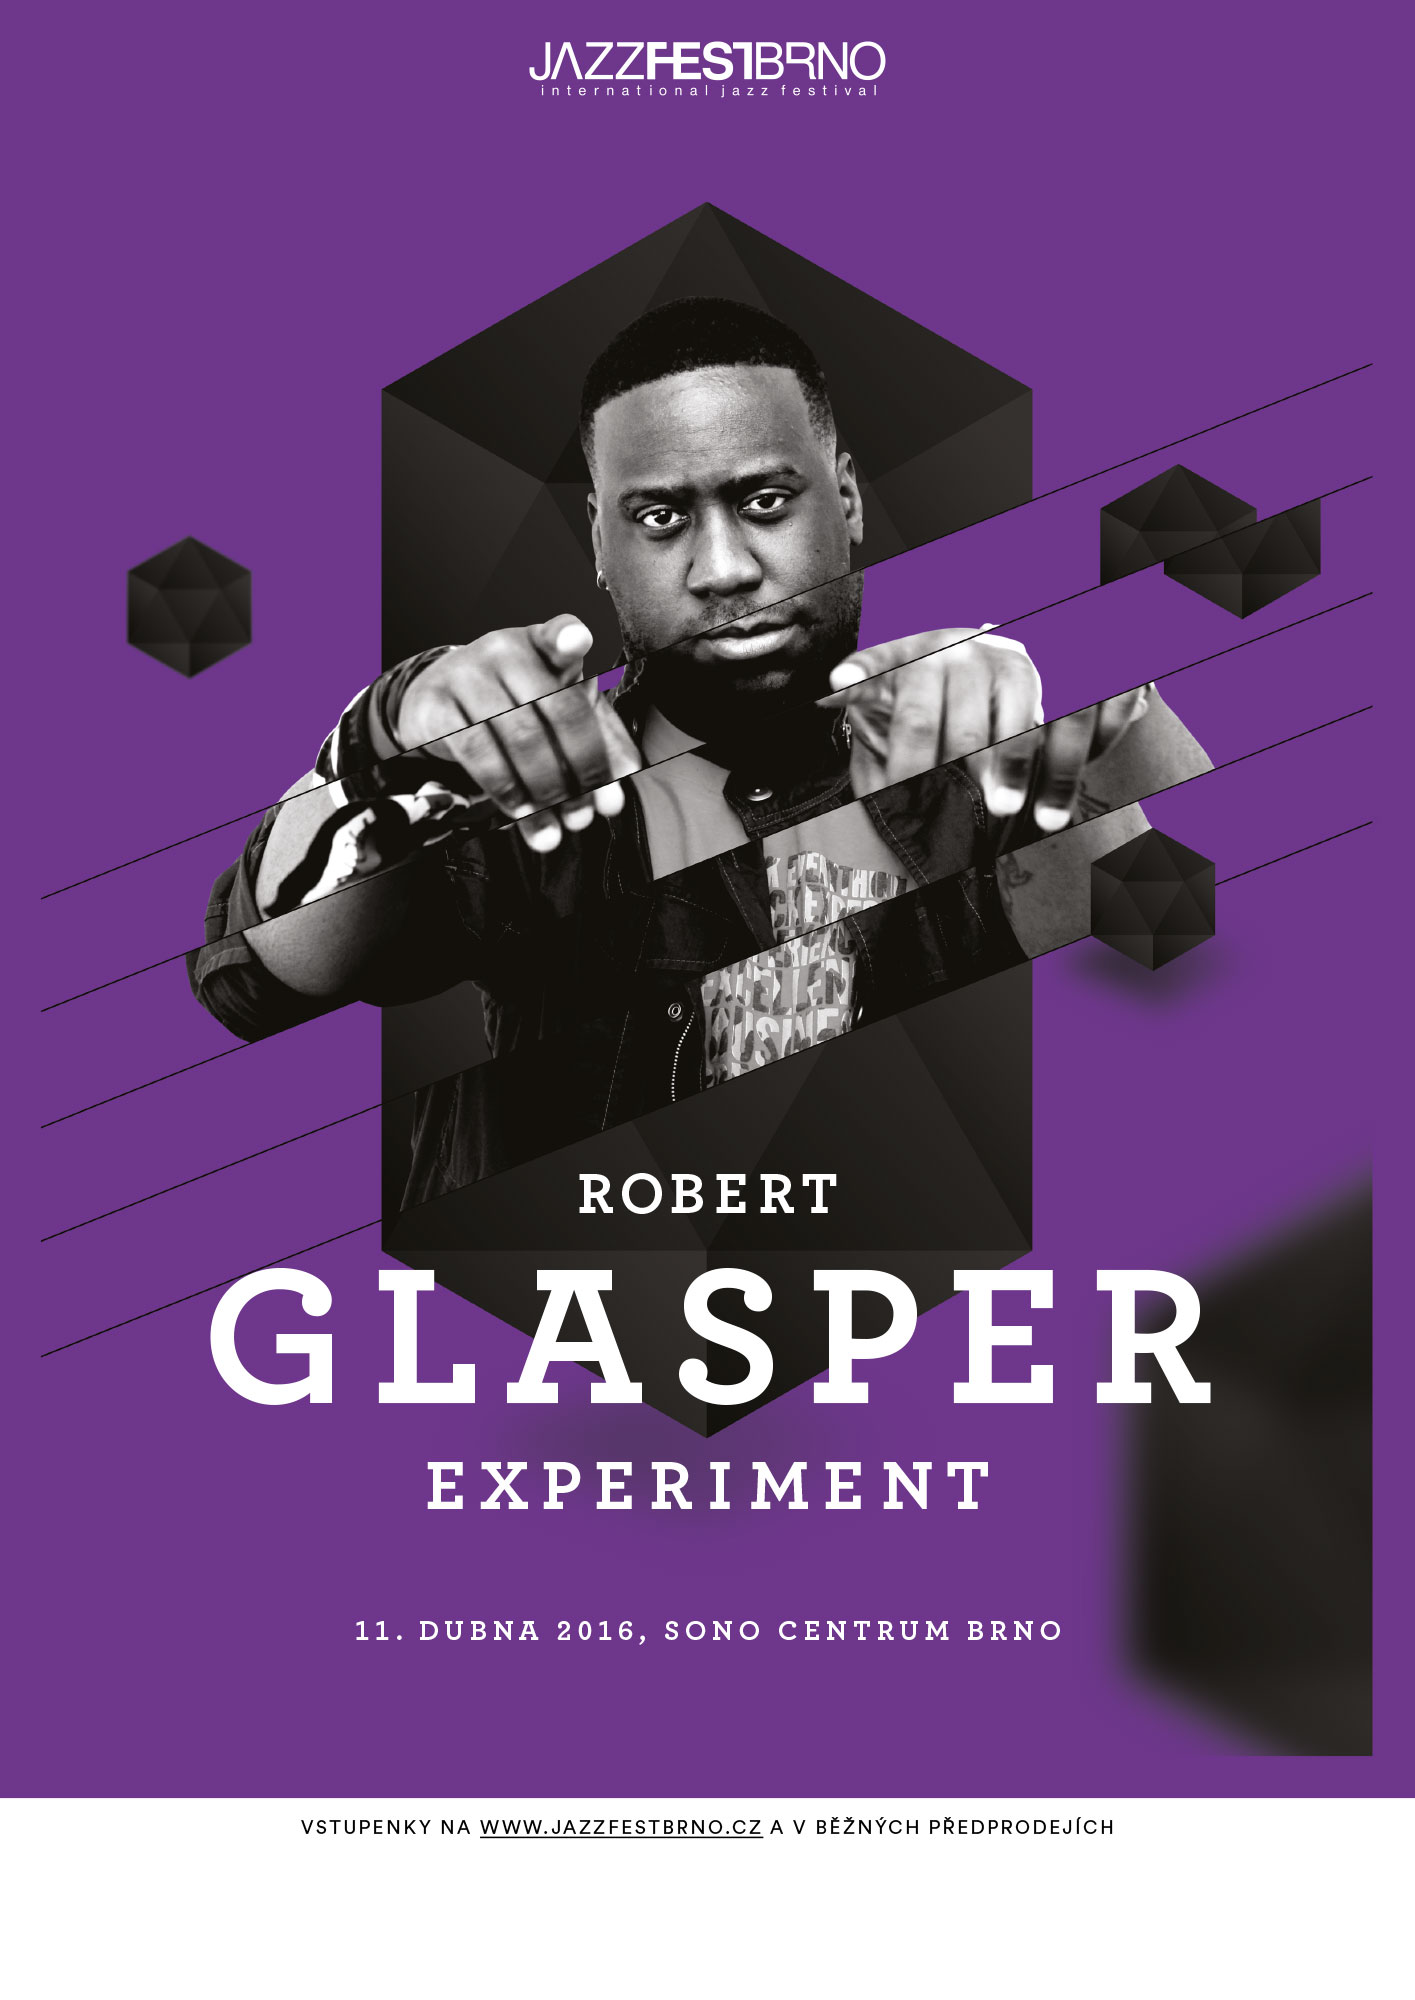 Jazzfestbrno 2016 - Robert Glasper Experiment